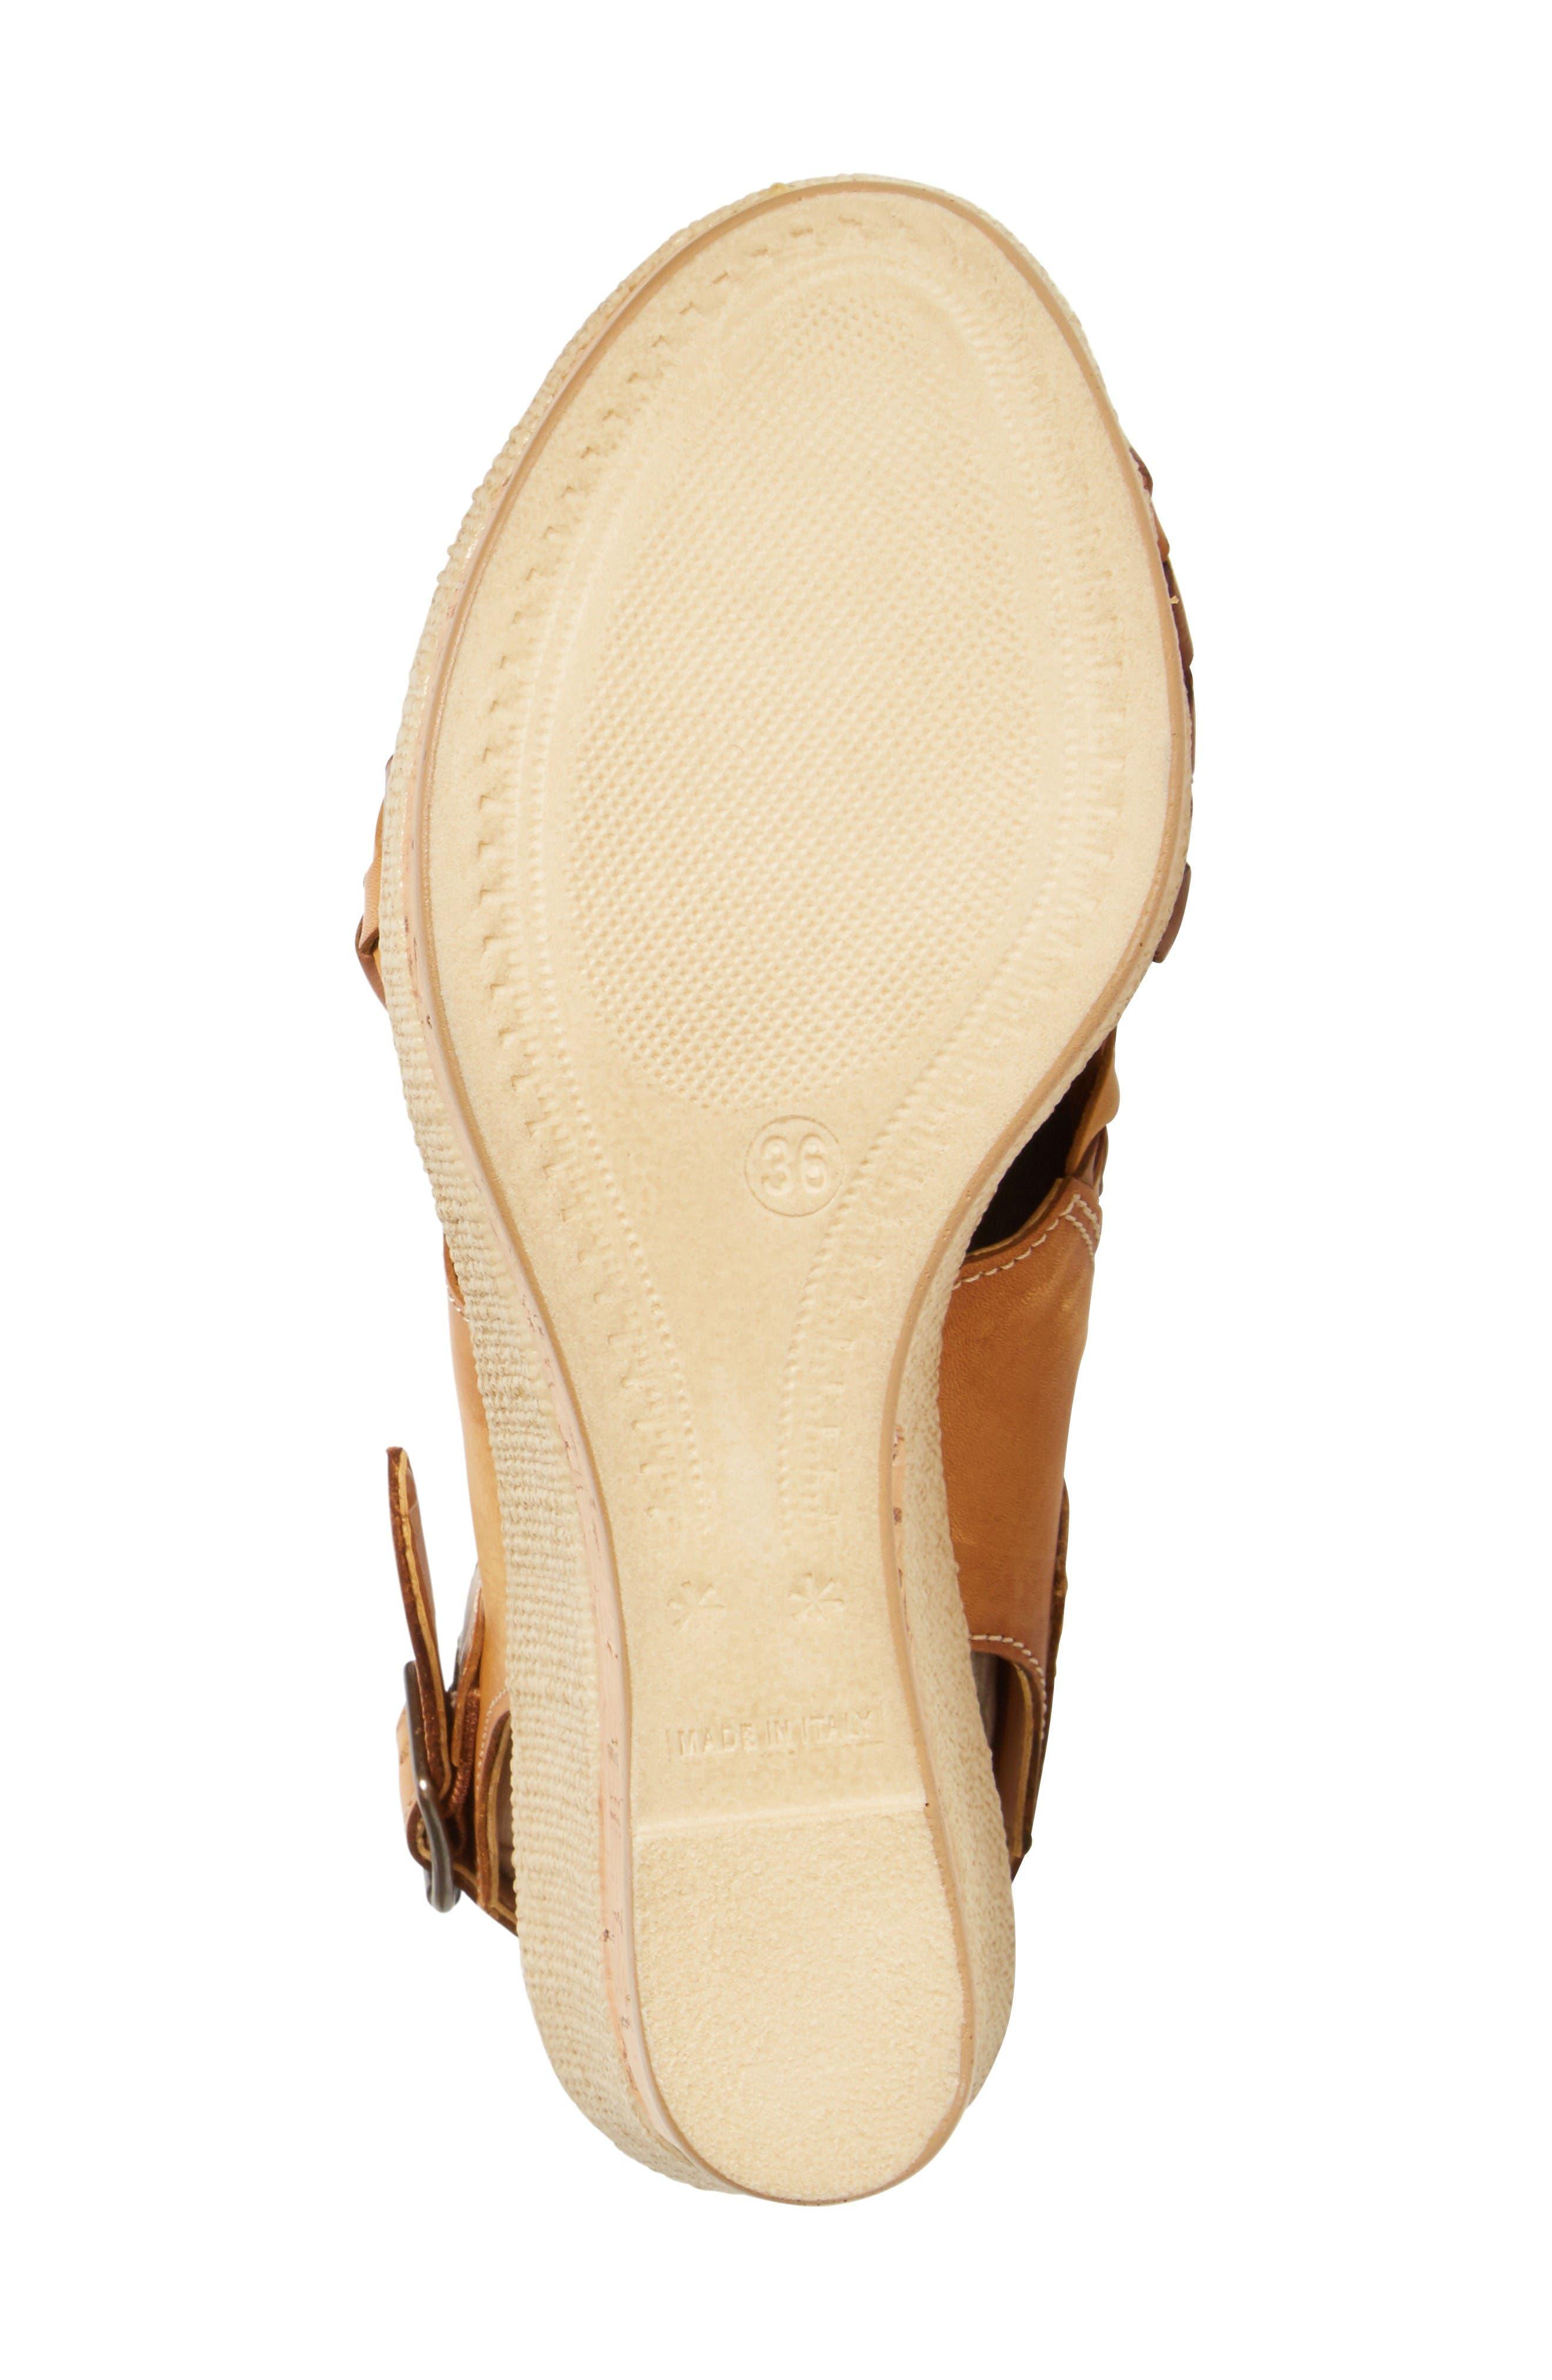 Love Wedge Sandal,                             Alternate thumbnail 4, color,                             Earth Leather